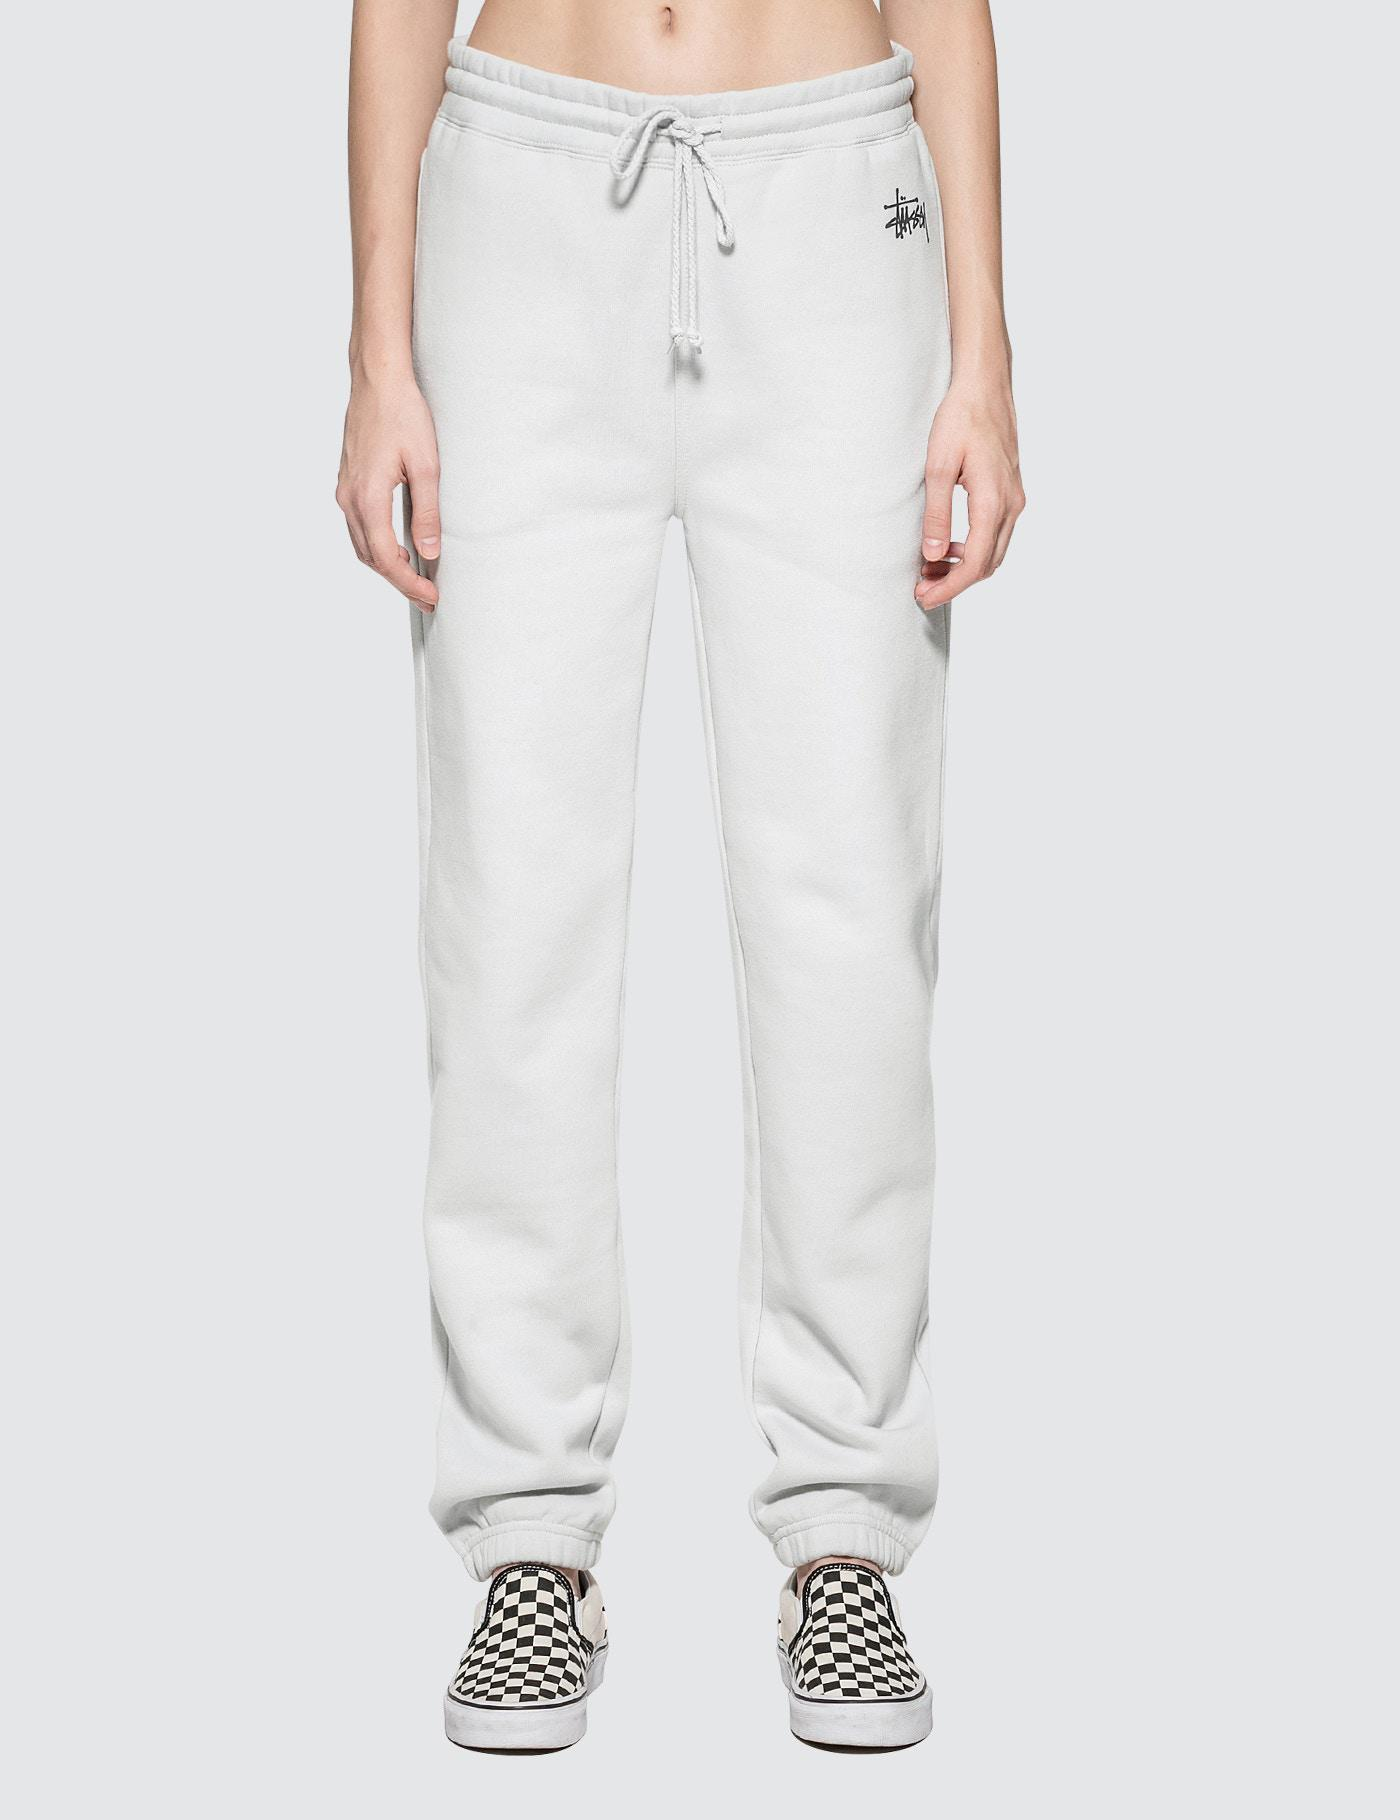 Dc Hbx Lyst Stussy Basic Sweatpant In White